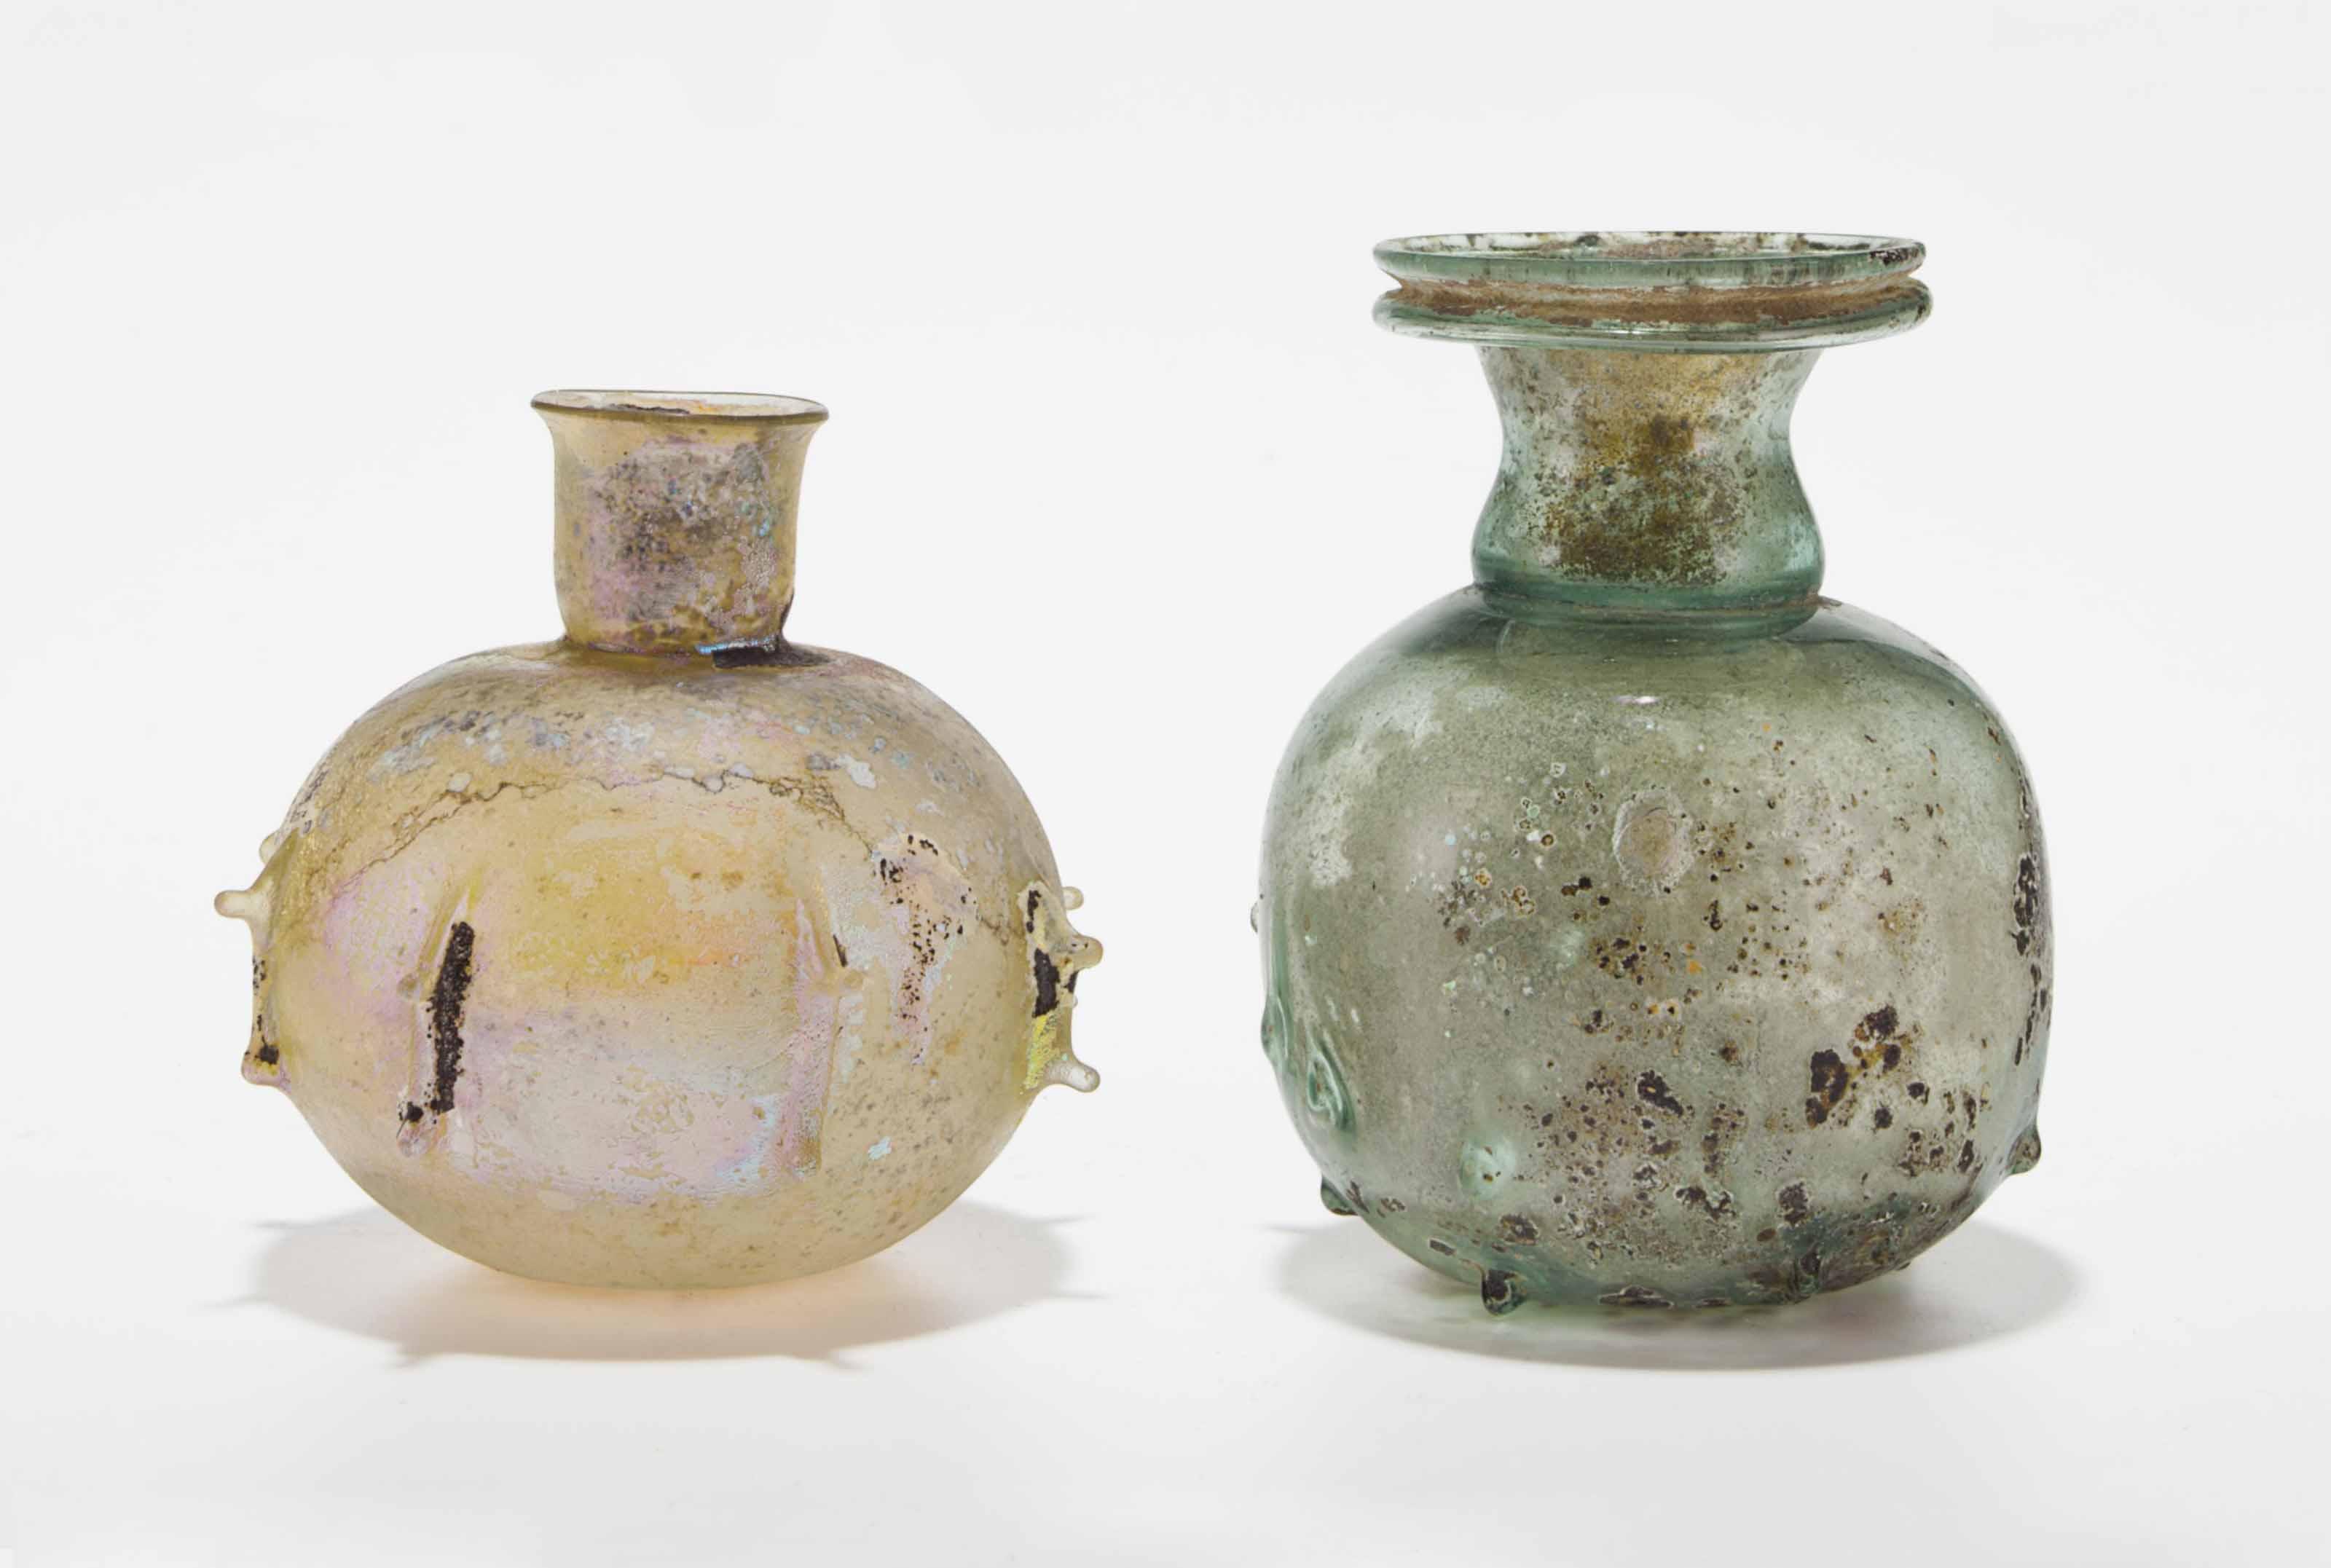 TWO ROMAN GLASS SPRINKLER FLAS